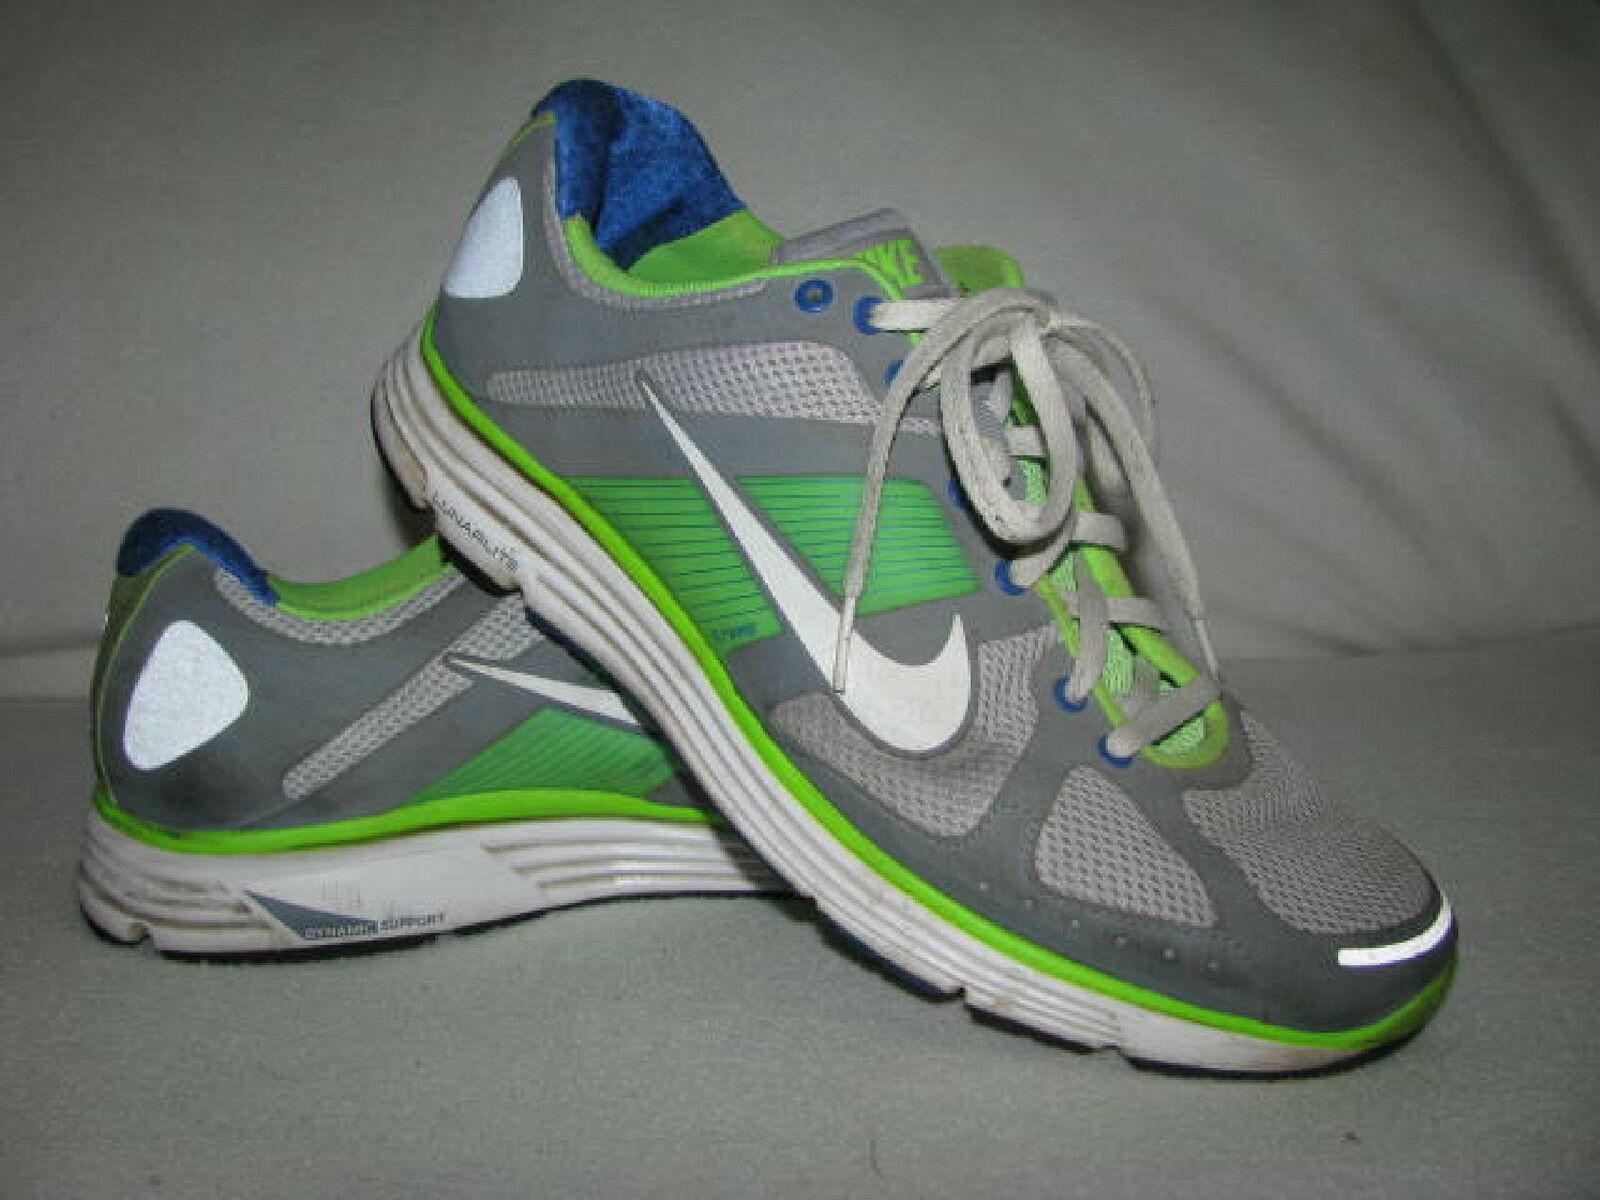 NIKE Lunar Elite Flywire Mens  Sz 12 Athletic Shoes Sneakers 386477-012